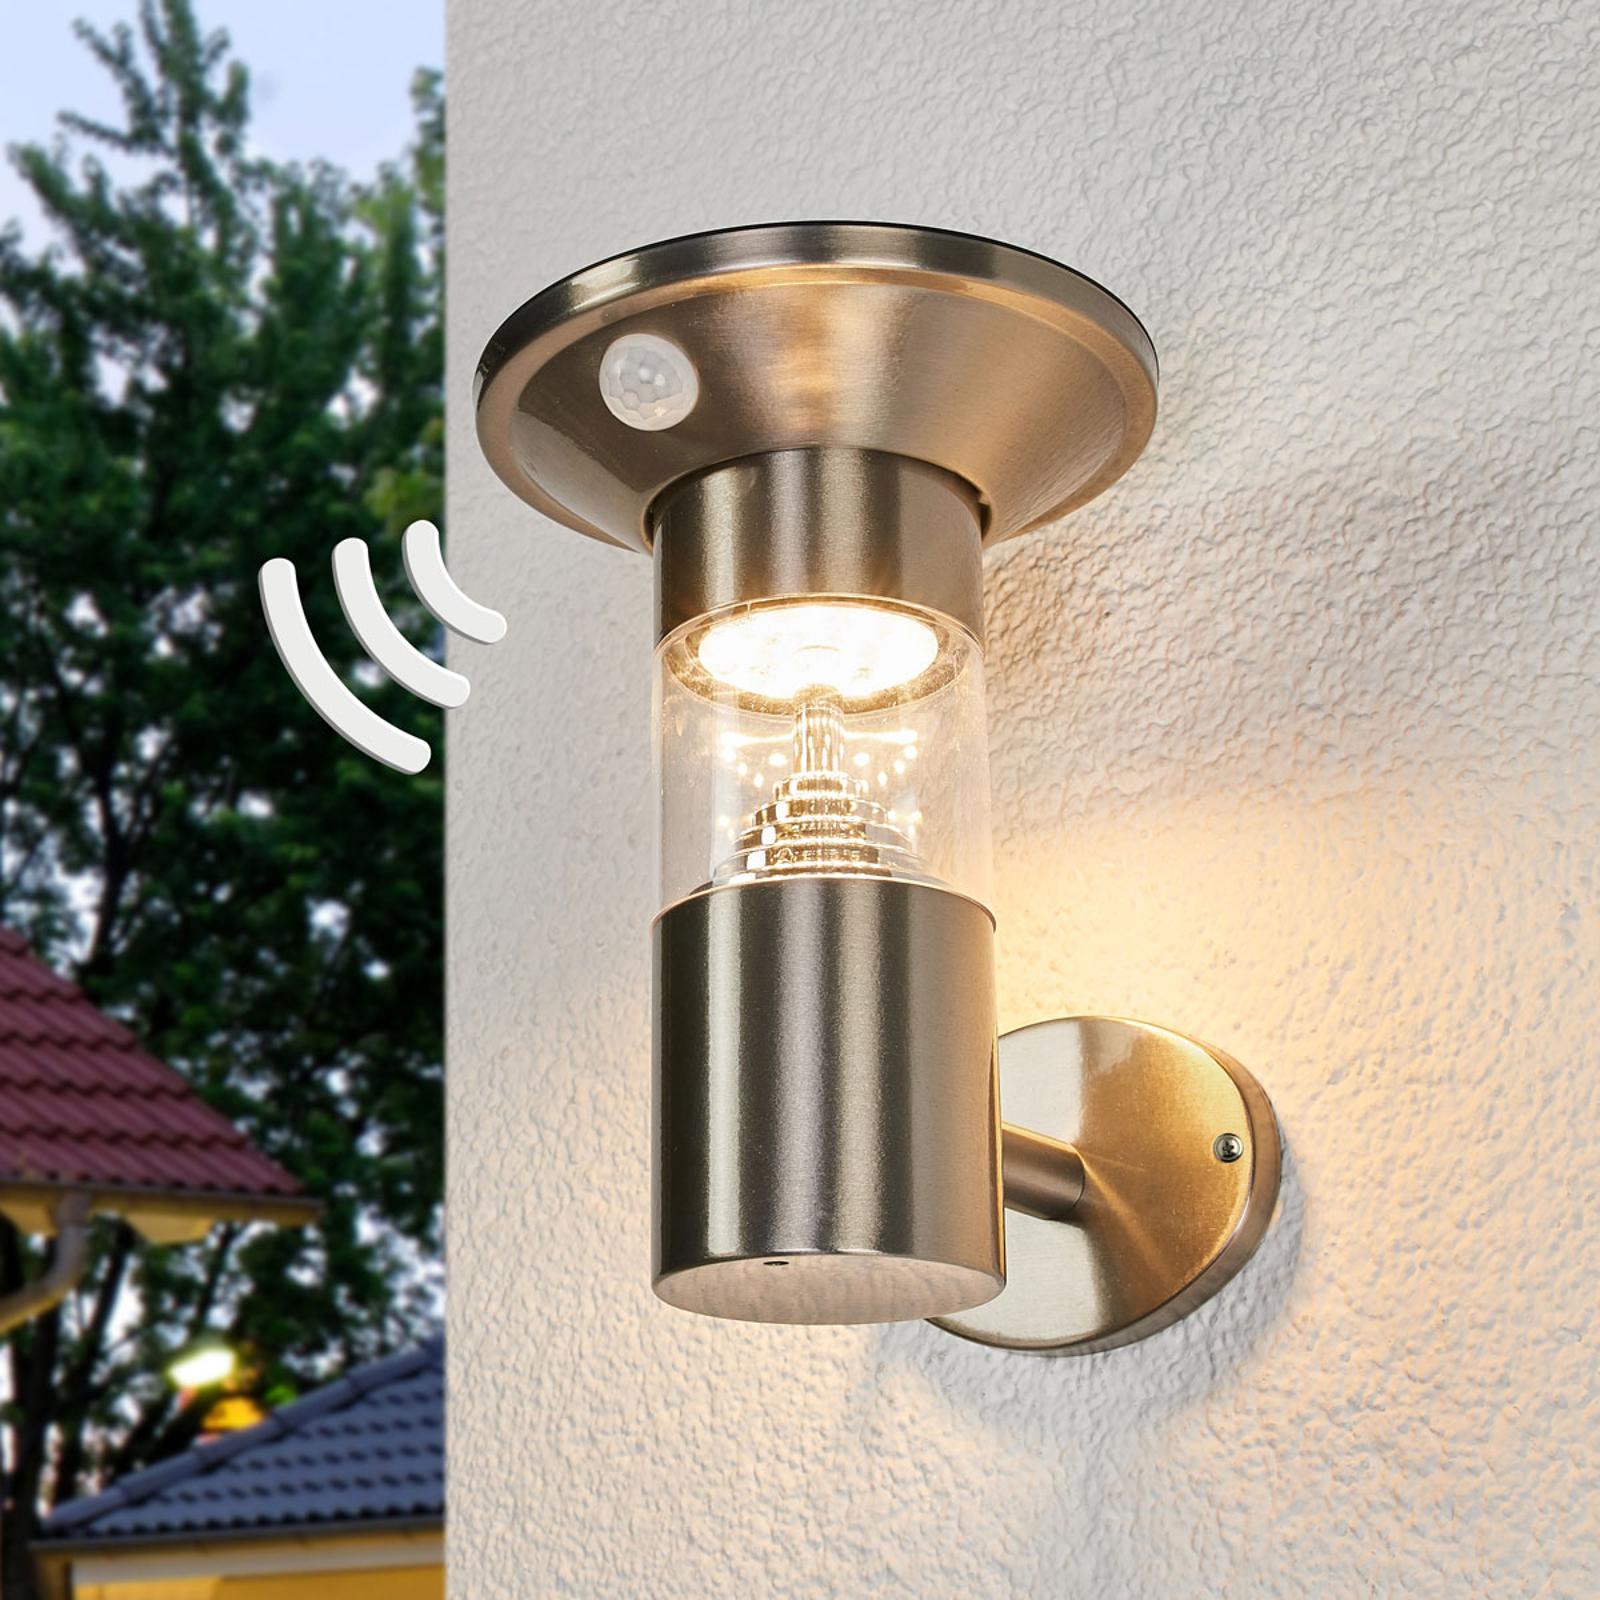 Solarna lampa ścienna LED Jalisa, czujnik